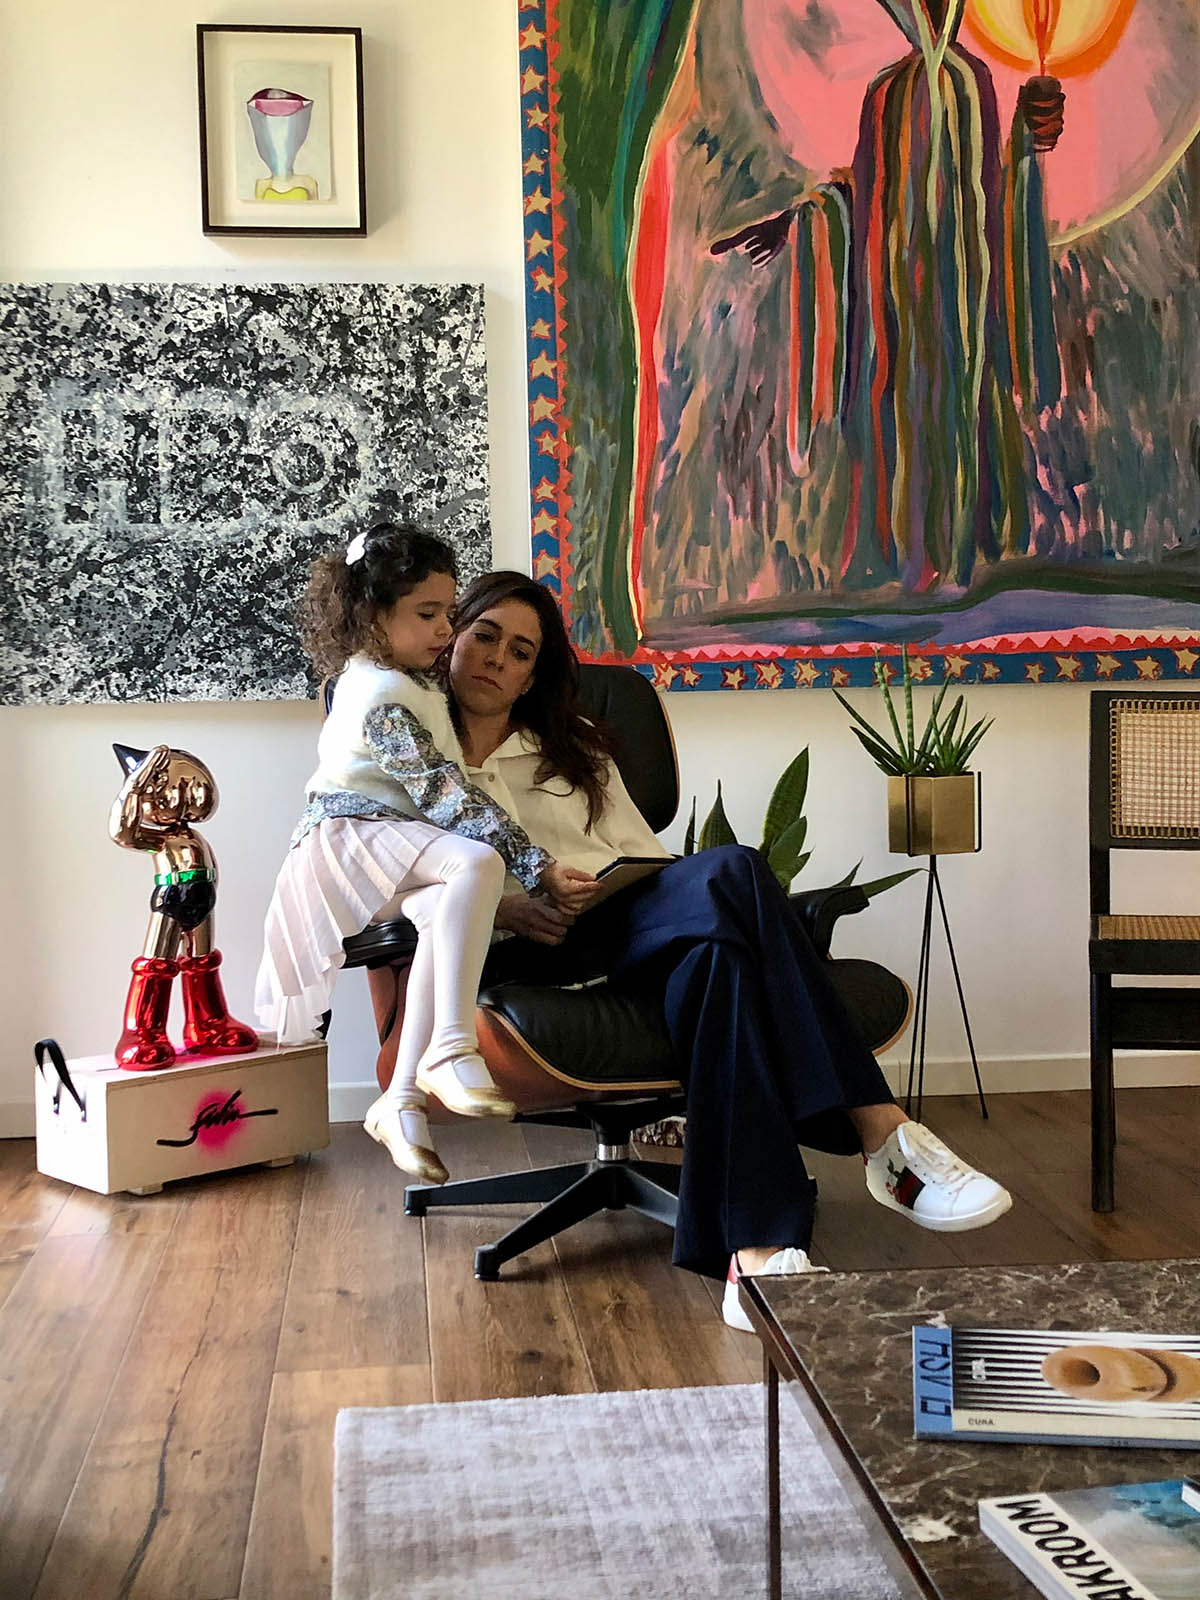 Irene & Sofia at home reading a magazine